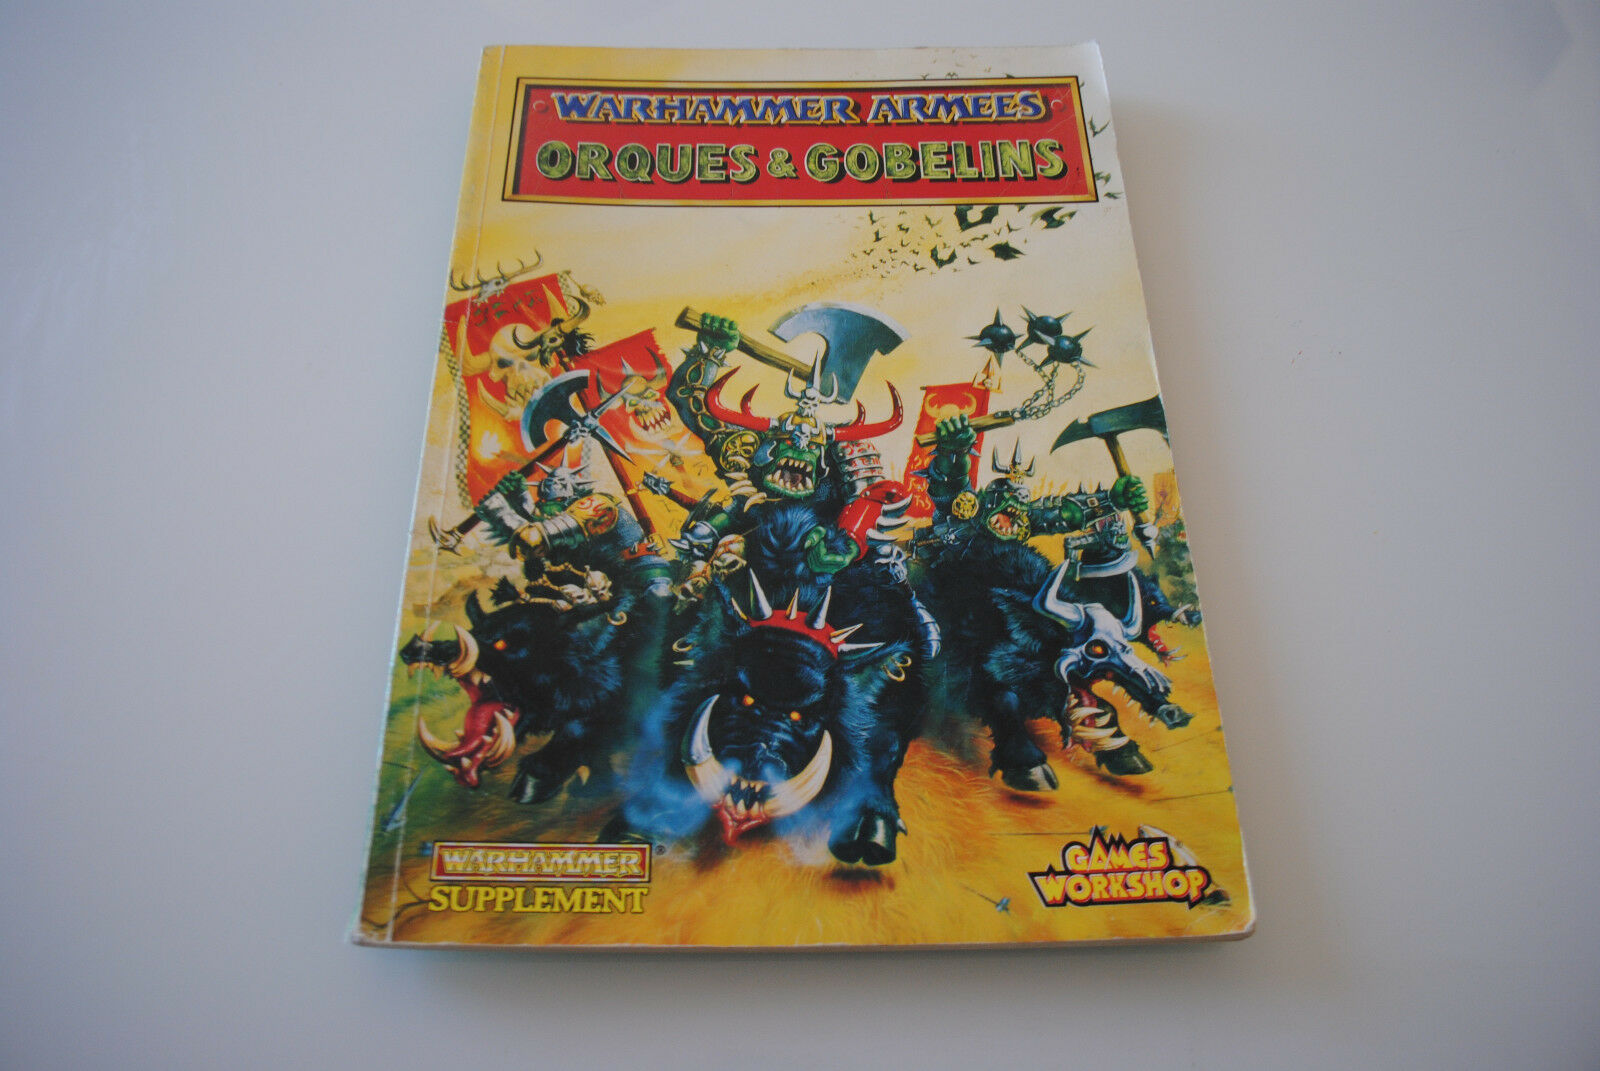 Livre WARHAMMER ARMEES ORQUES & GOBELINS (Version Française)